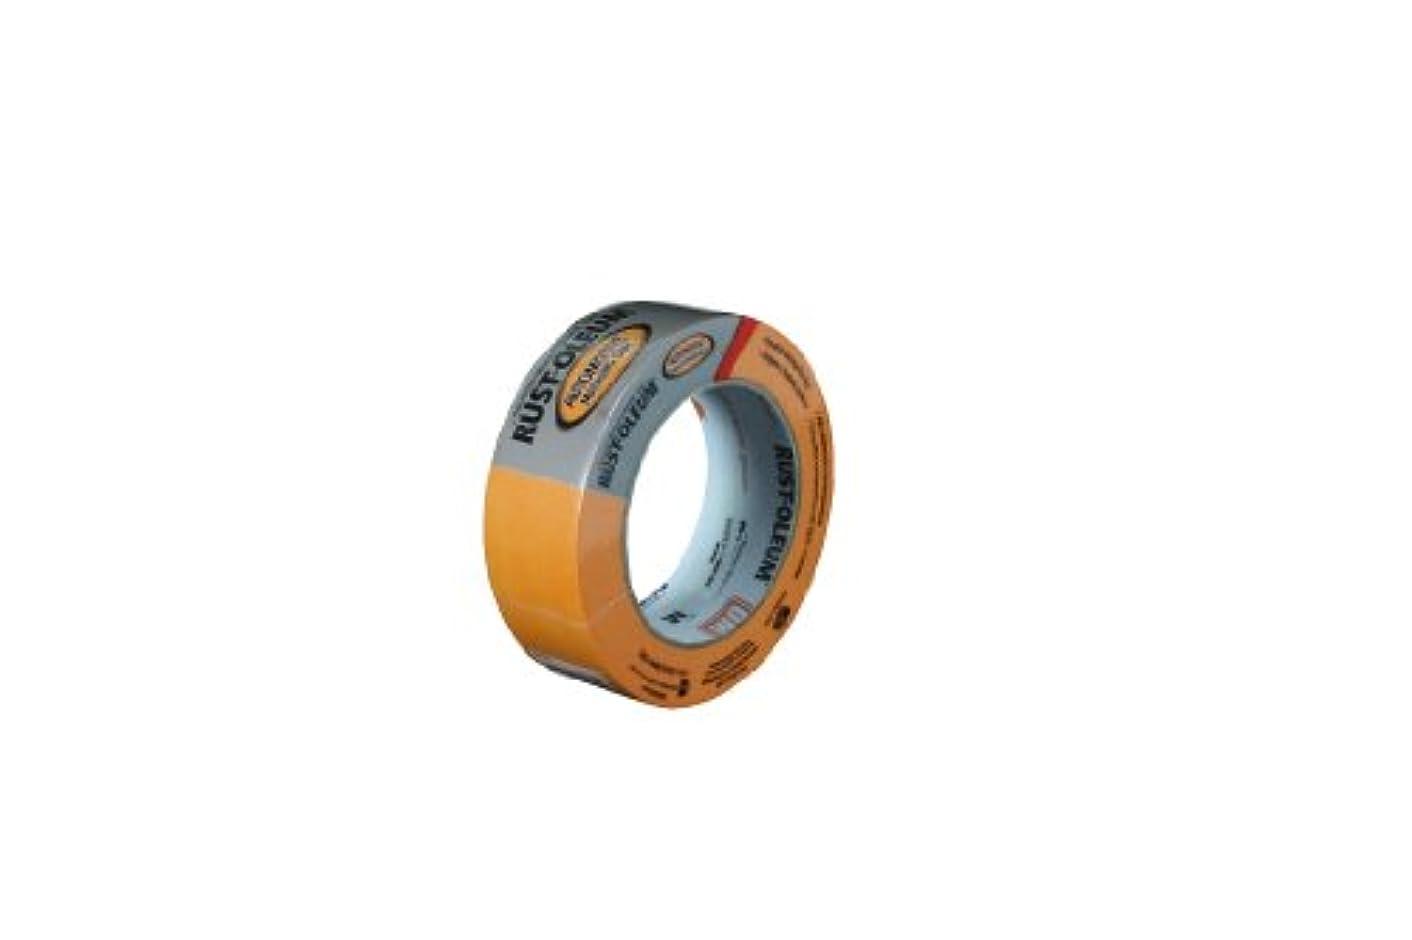 IPG Rust-OLEUM Orange Masking Tape, 1.41